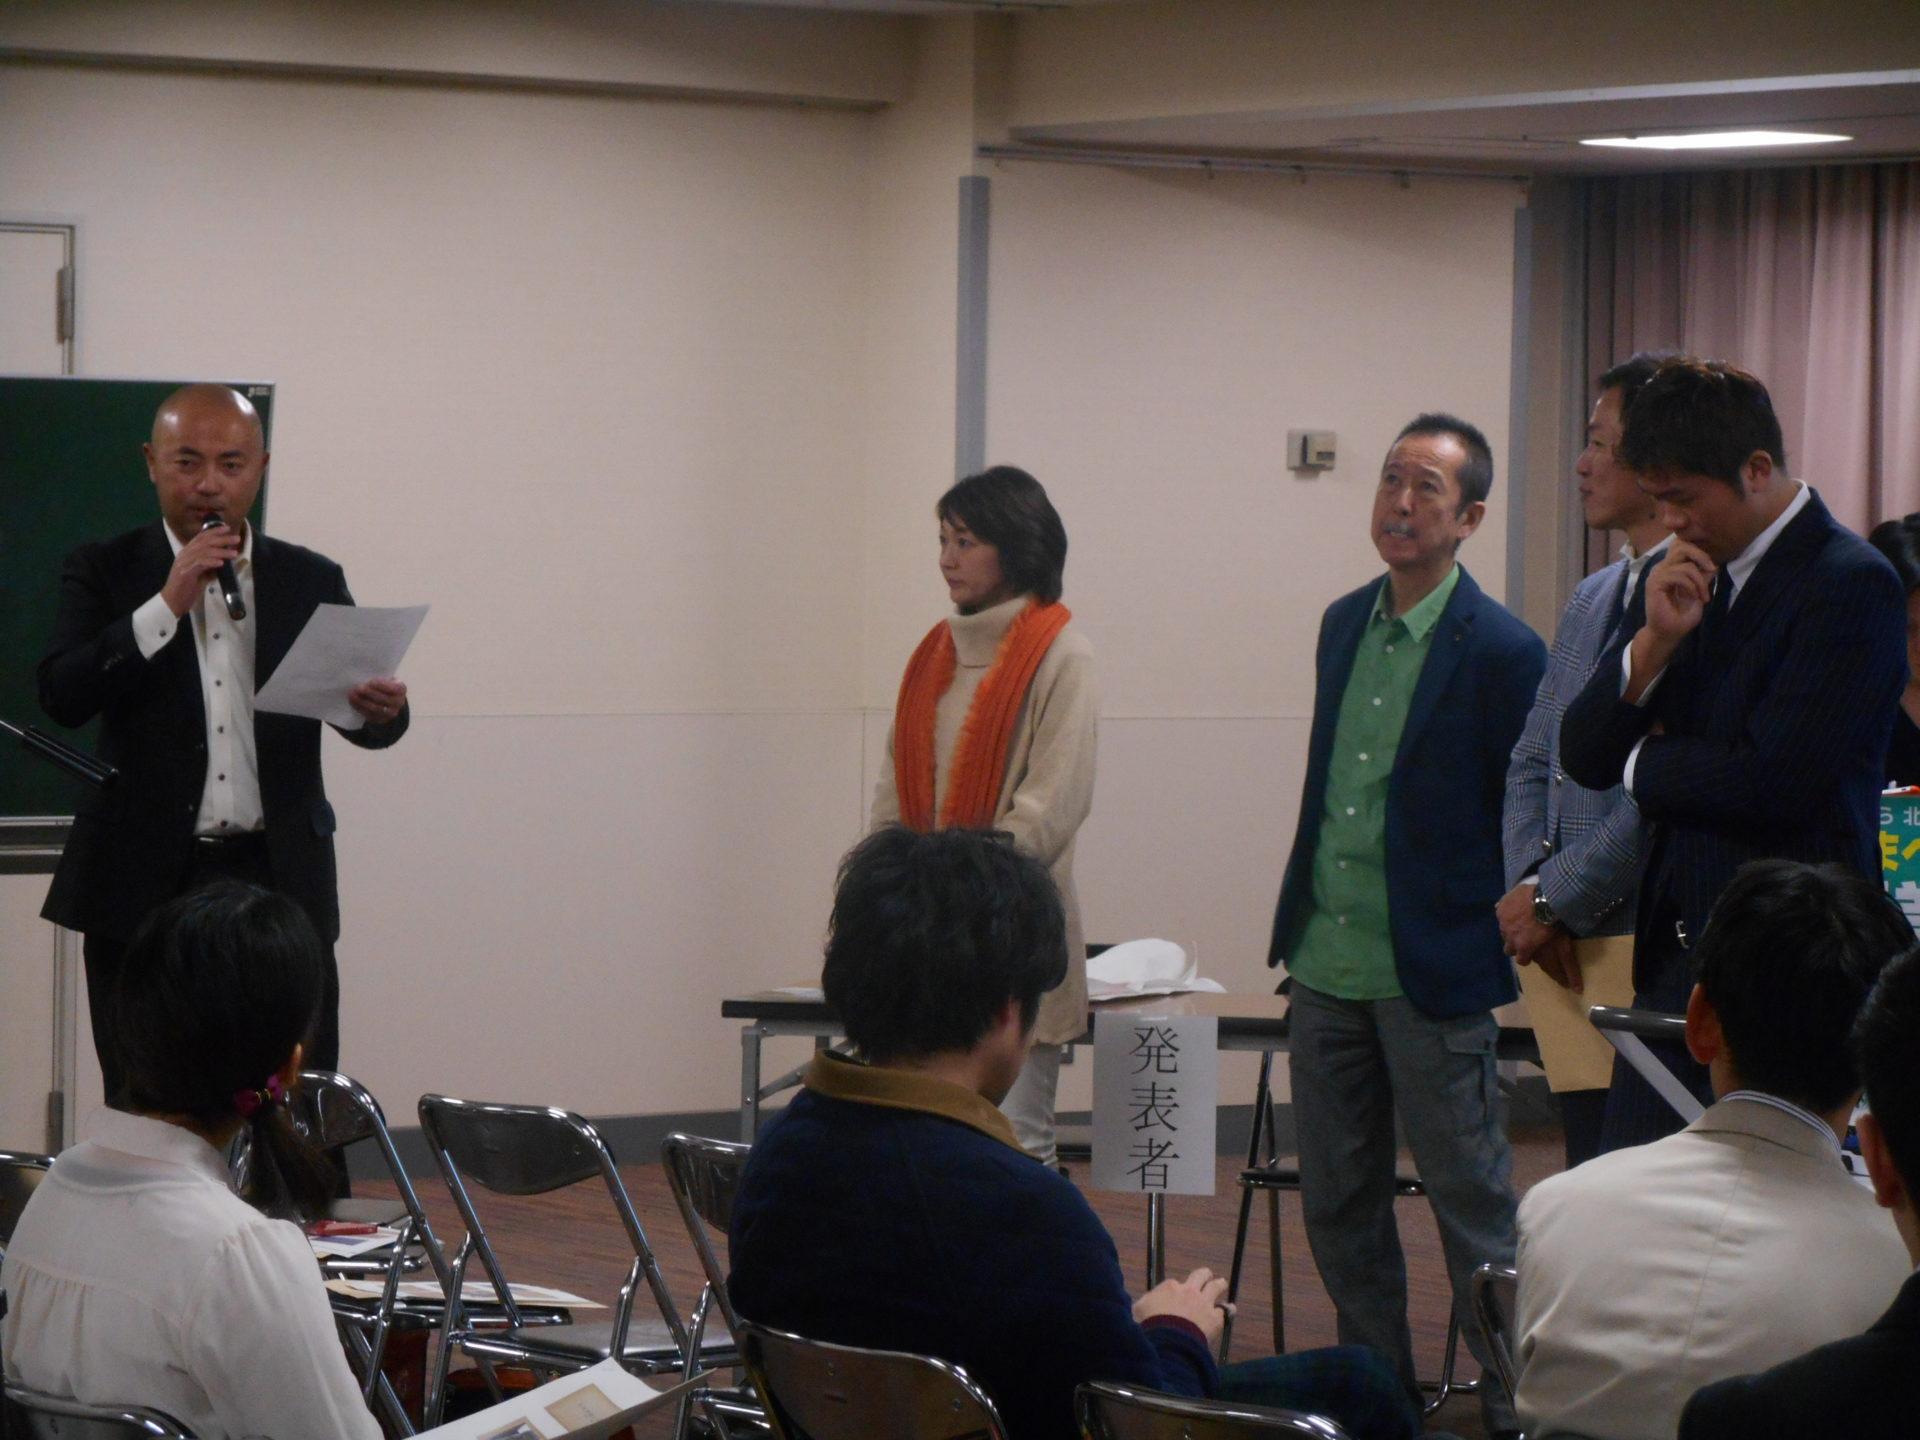 DSCN2751 1920x1440 - 第5回青森ゼミナールのアドバイザーで天間会長、西村副会長参加